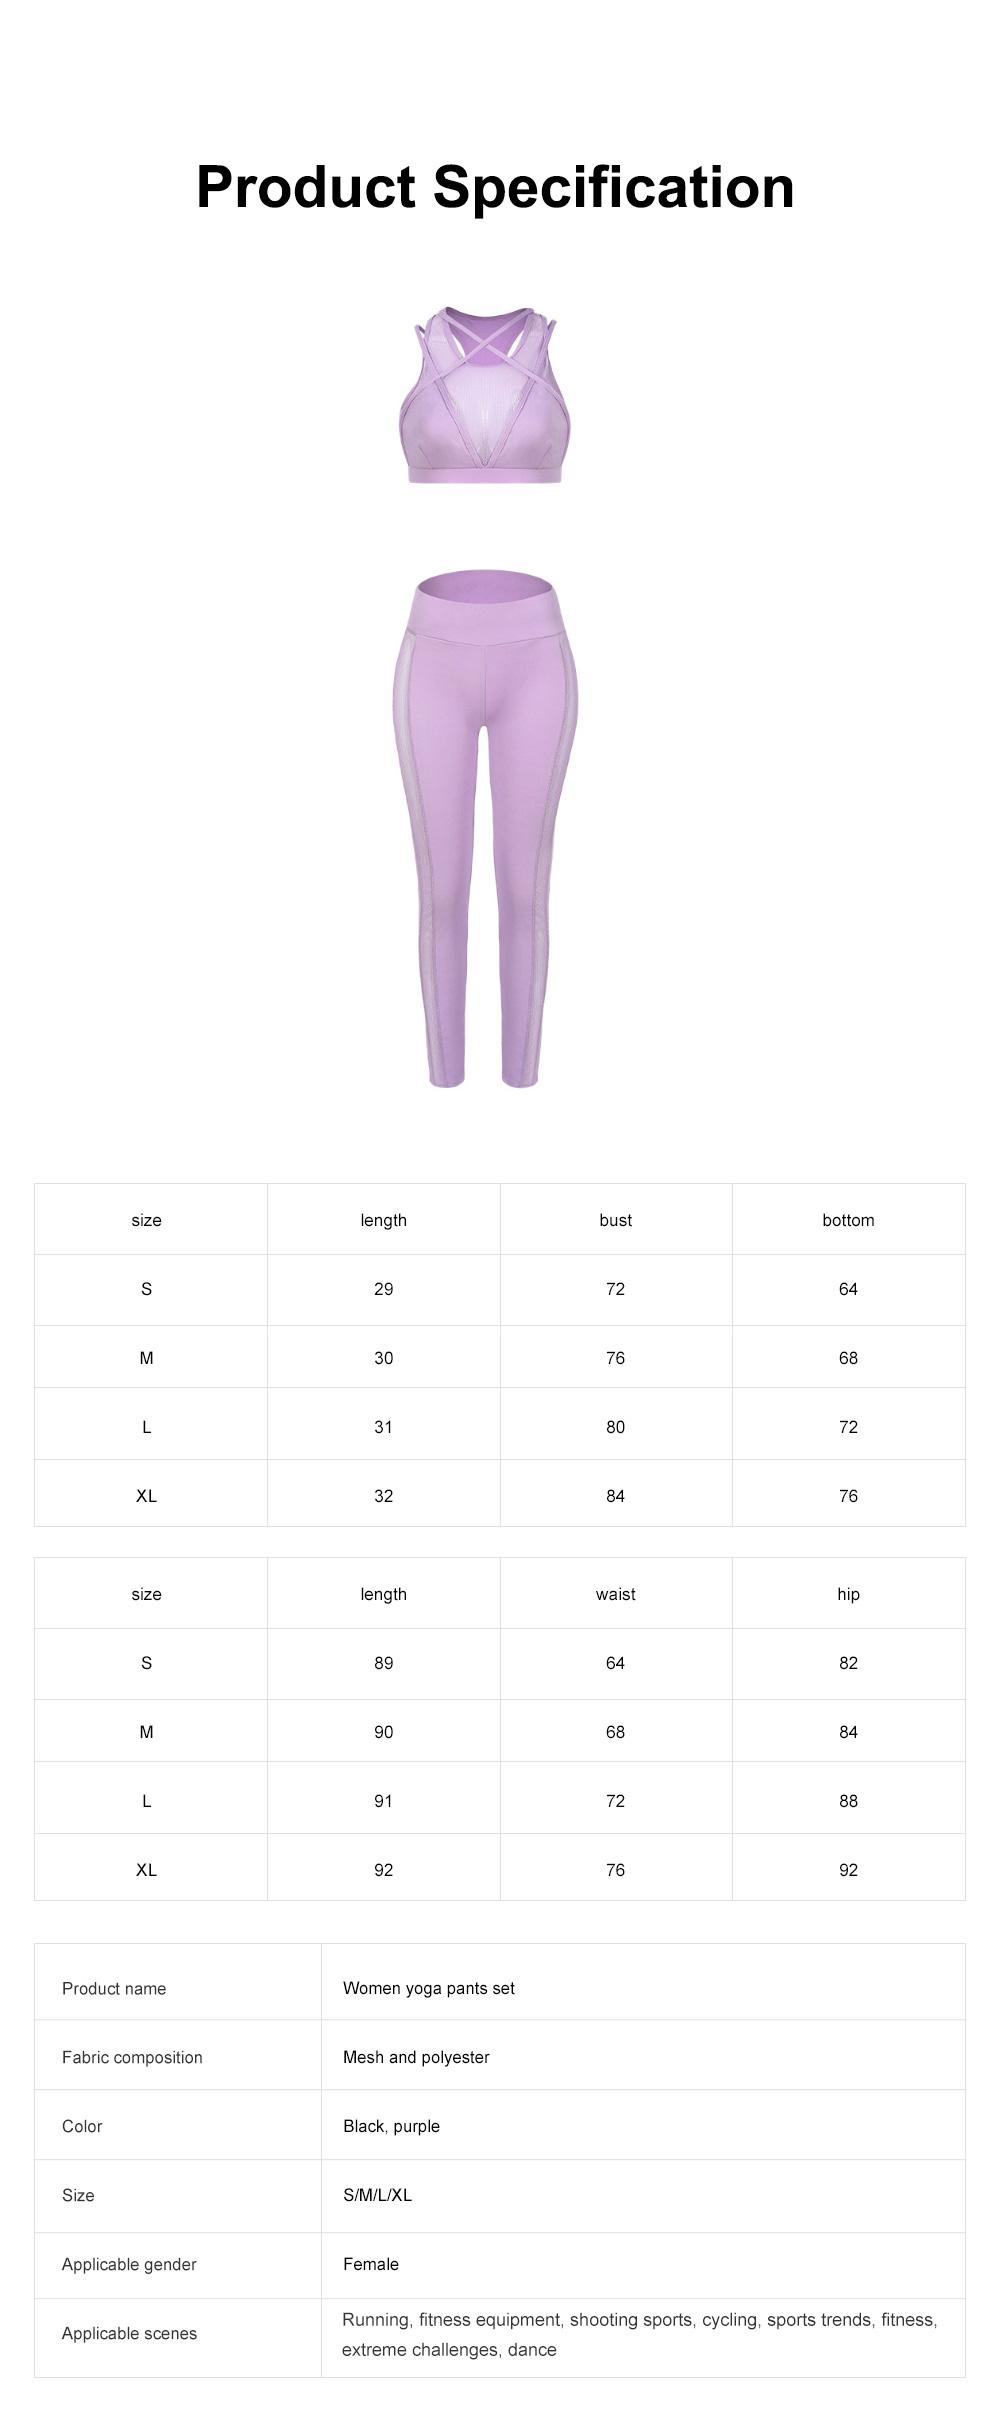 Fashion Sexy Women Two Piece Sport Bra Pants Yoga Fitness Hip Pants Set Cross Straps Hollow Matching Mesh Lady Wear Set 6